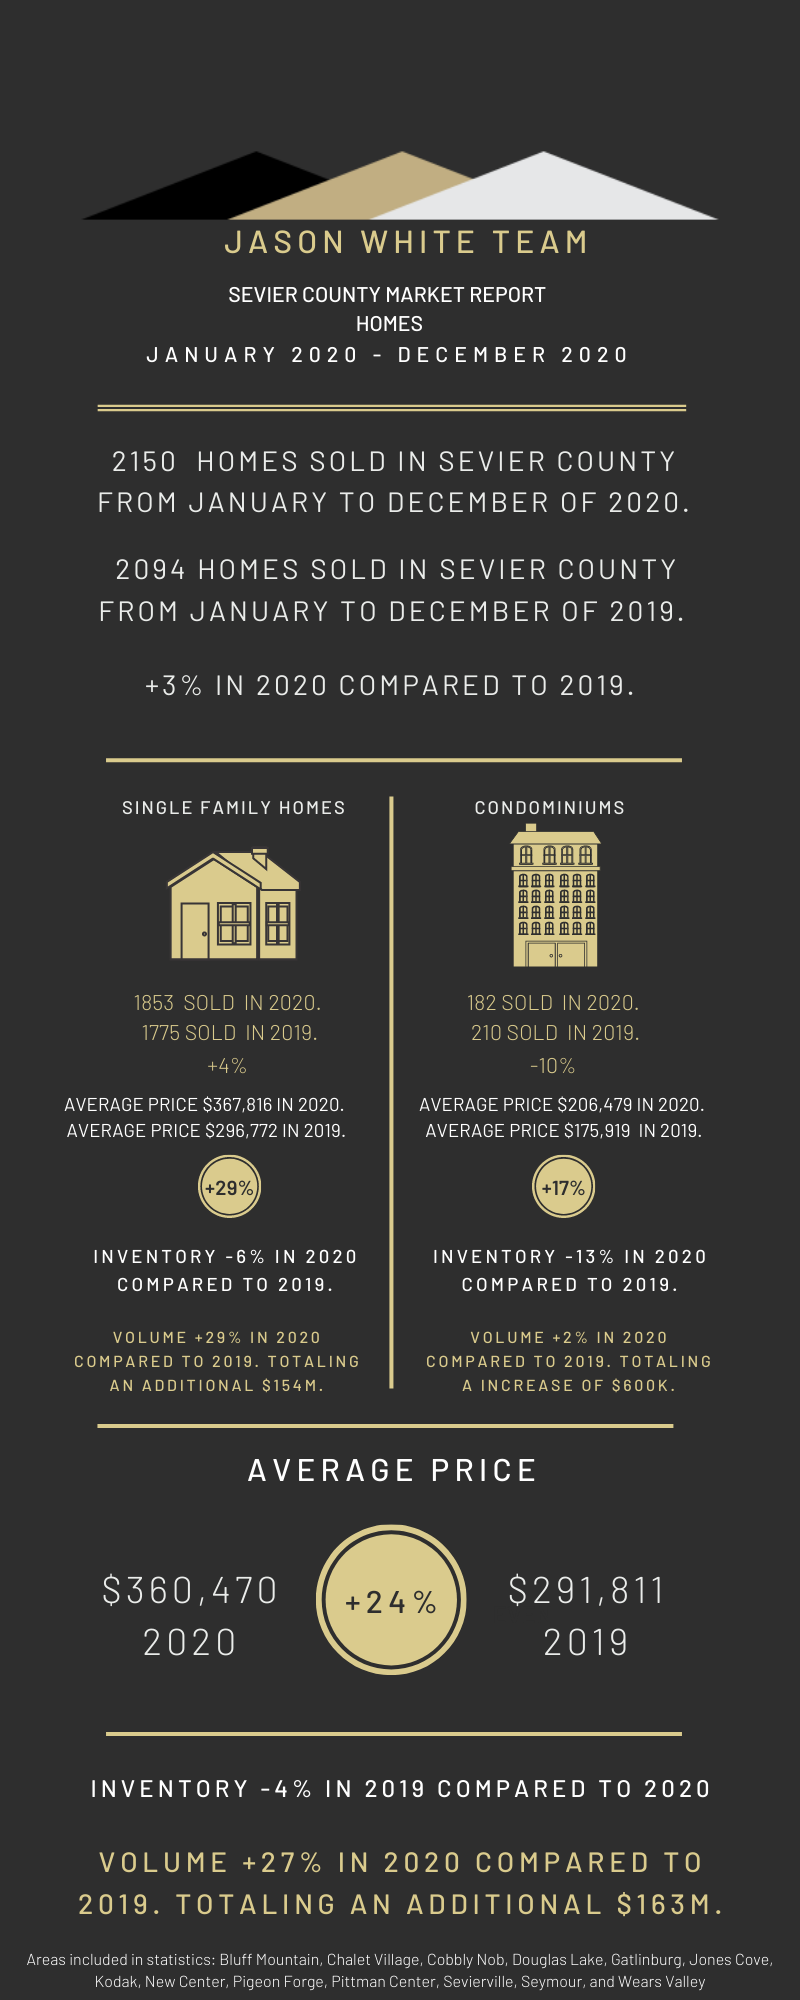 YTD 2020 Real Estate Market Statistics